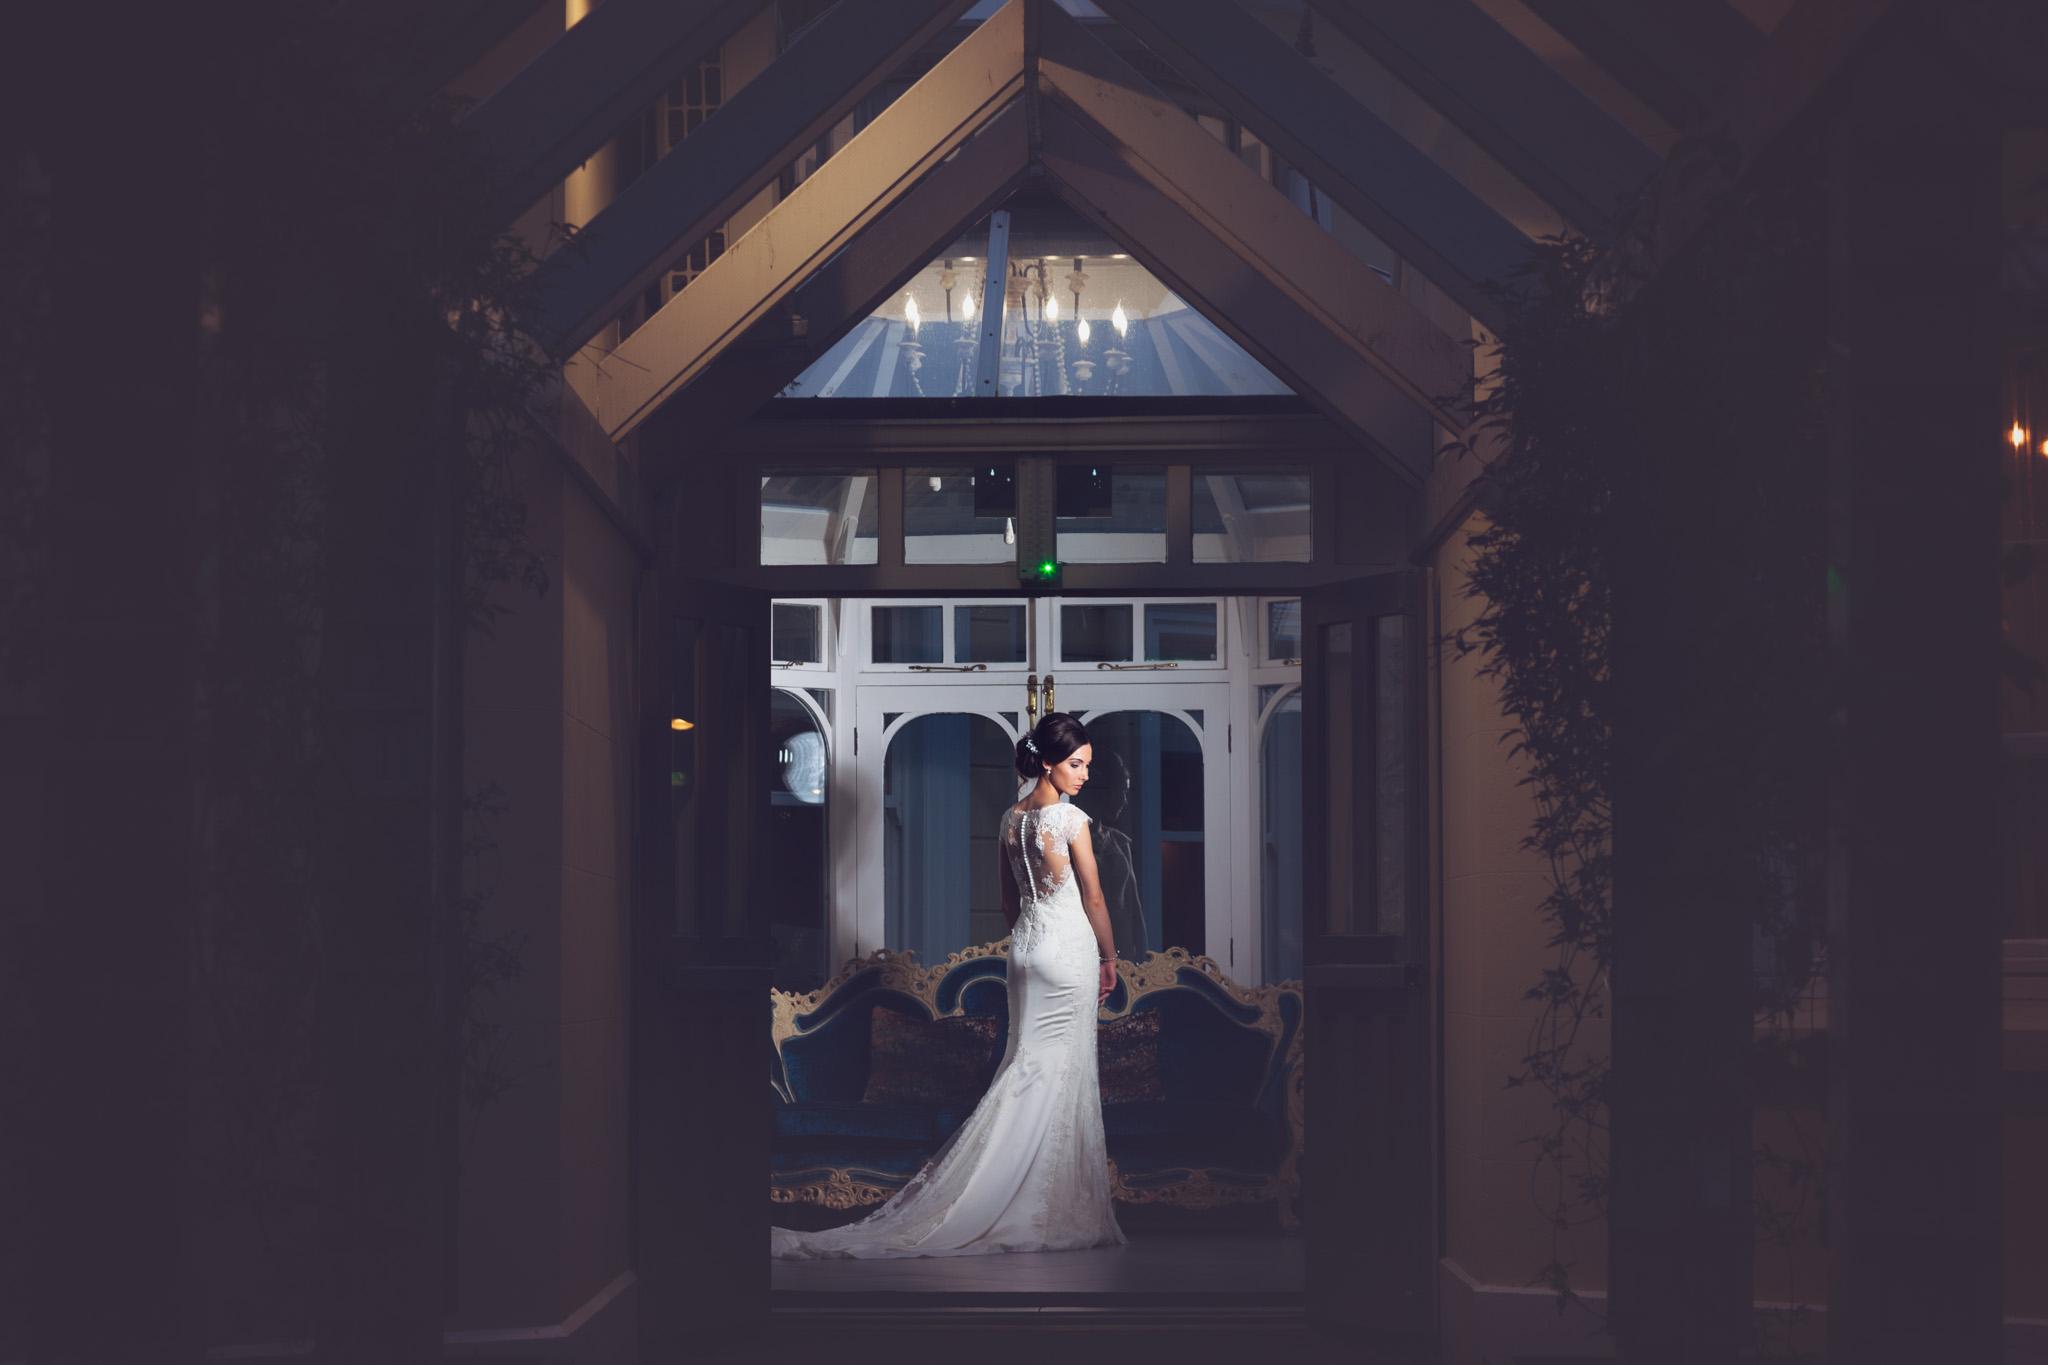 Mark_Barnes_Northern_Ireland_Wedding_Photography_Leighinmohr-house-hotel-ballymena_Wedding_Photography-63.jpg